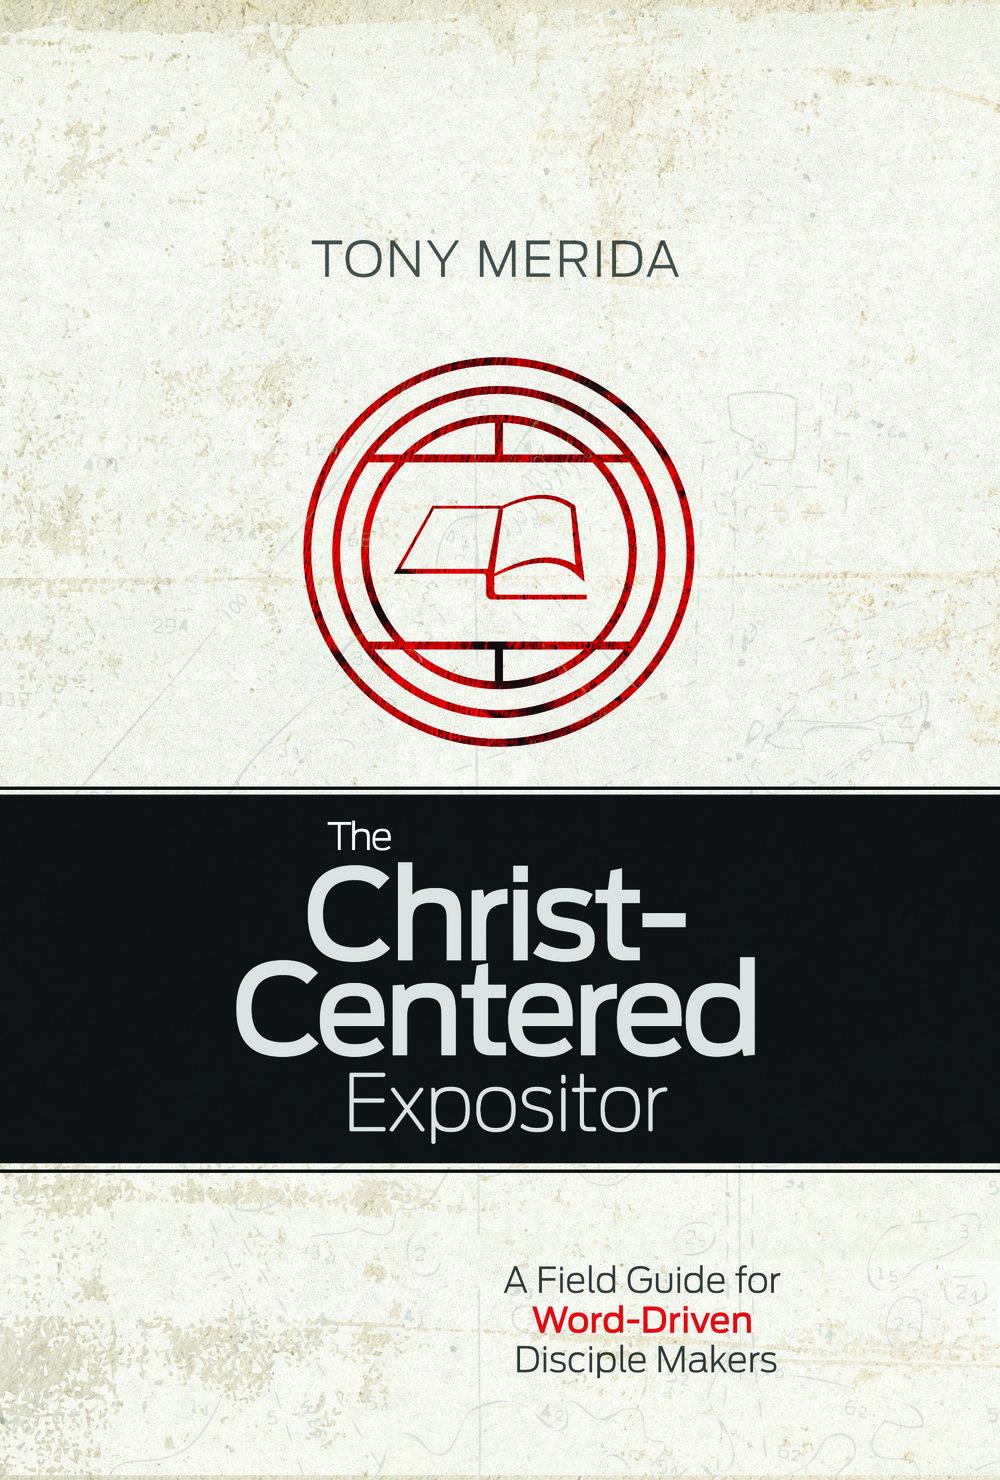 TheChrist-CenteredExpositor.jpg